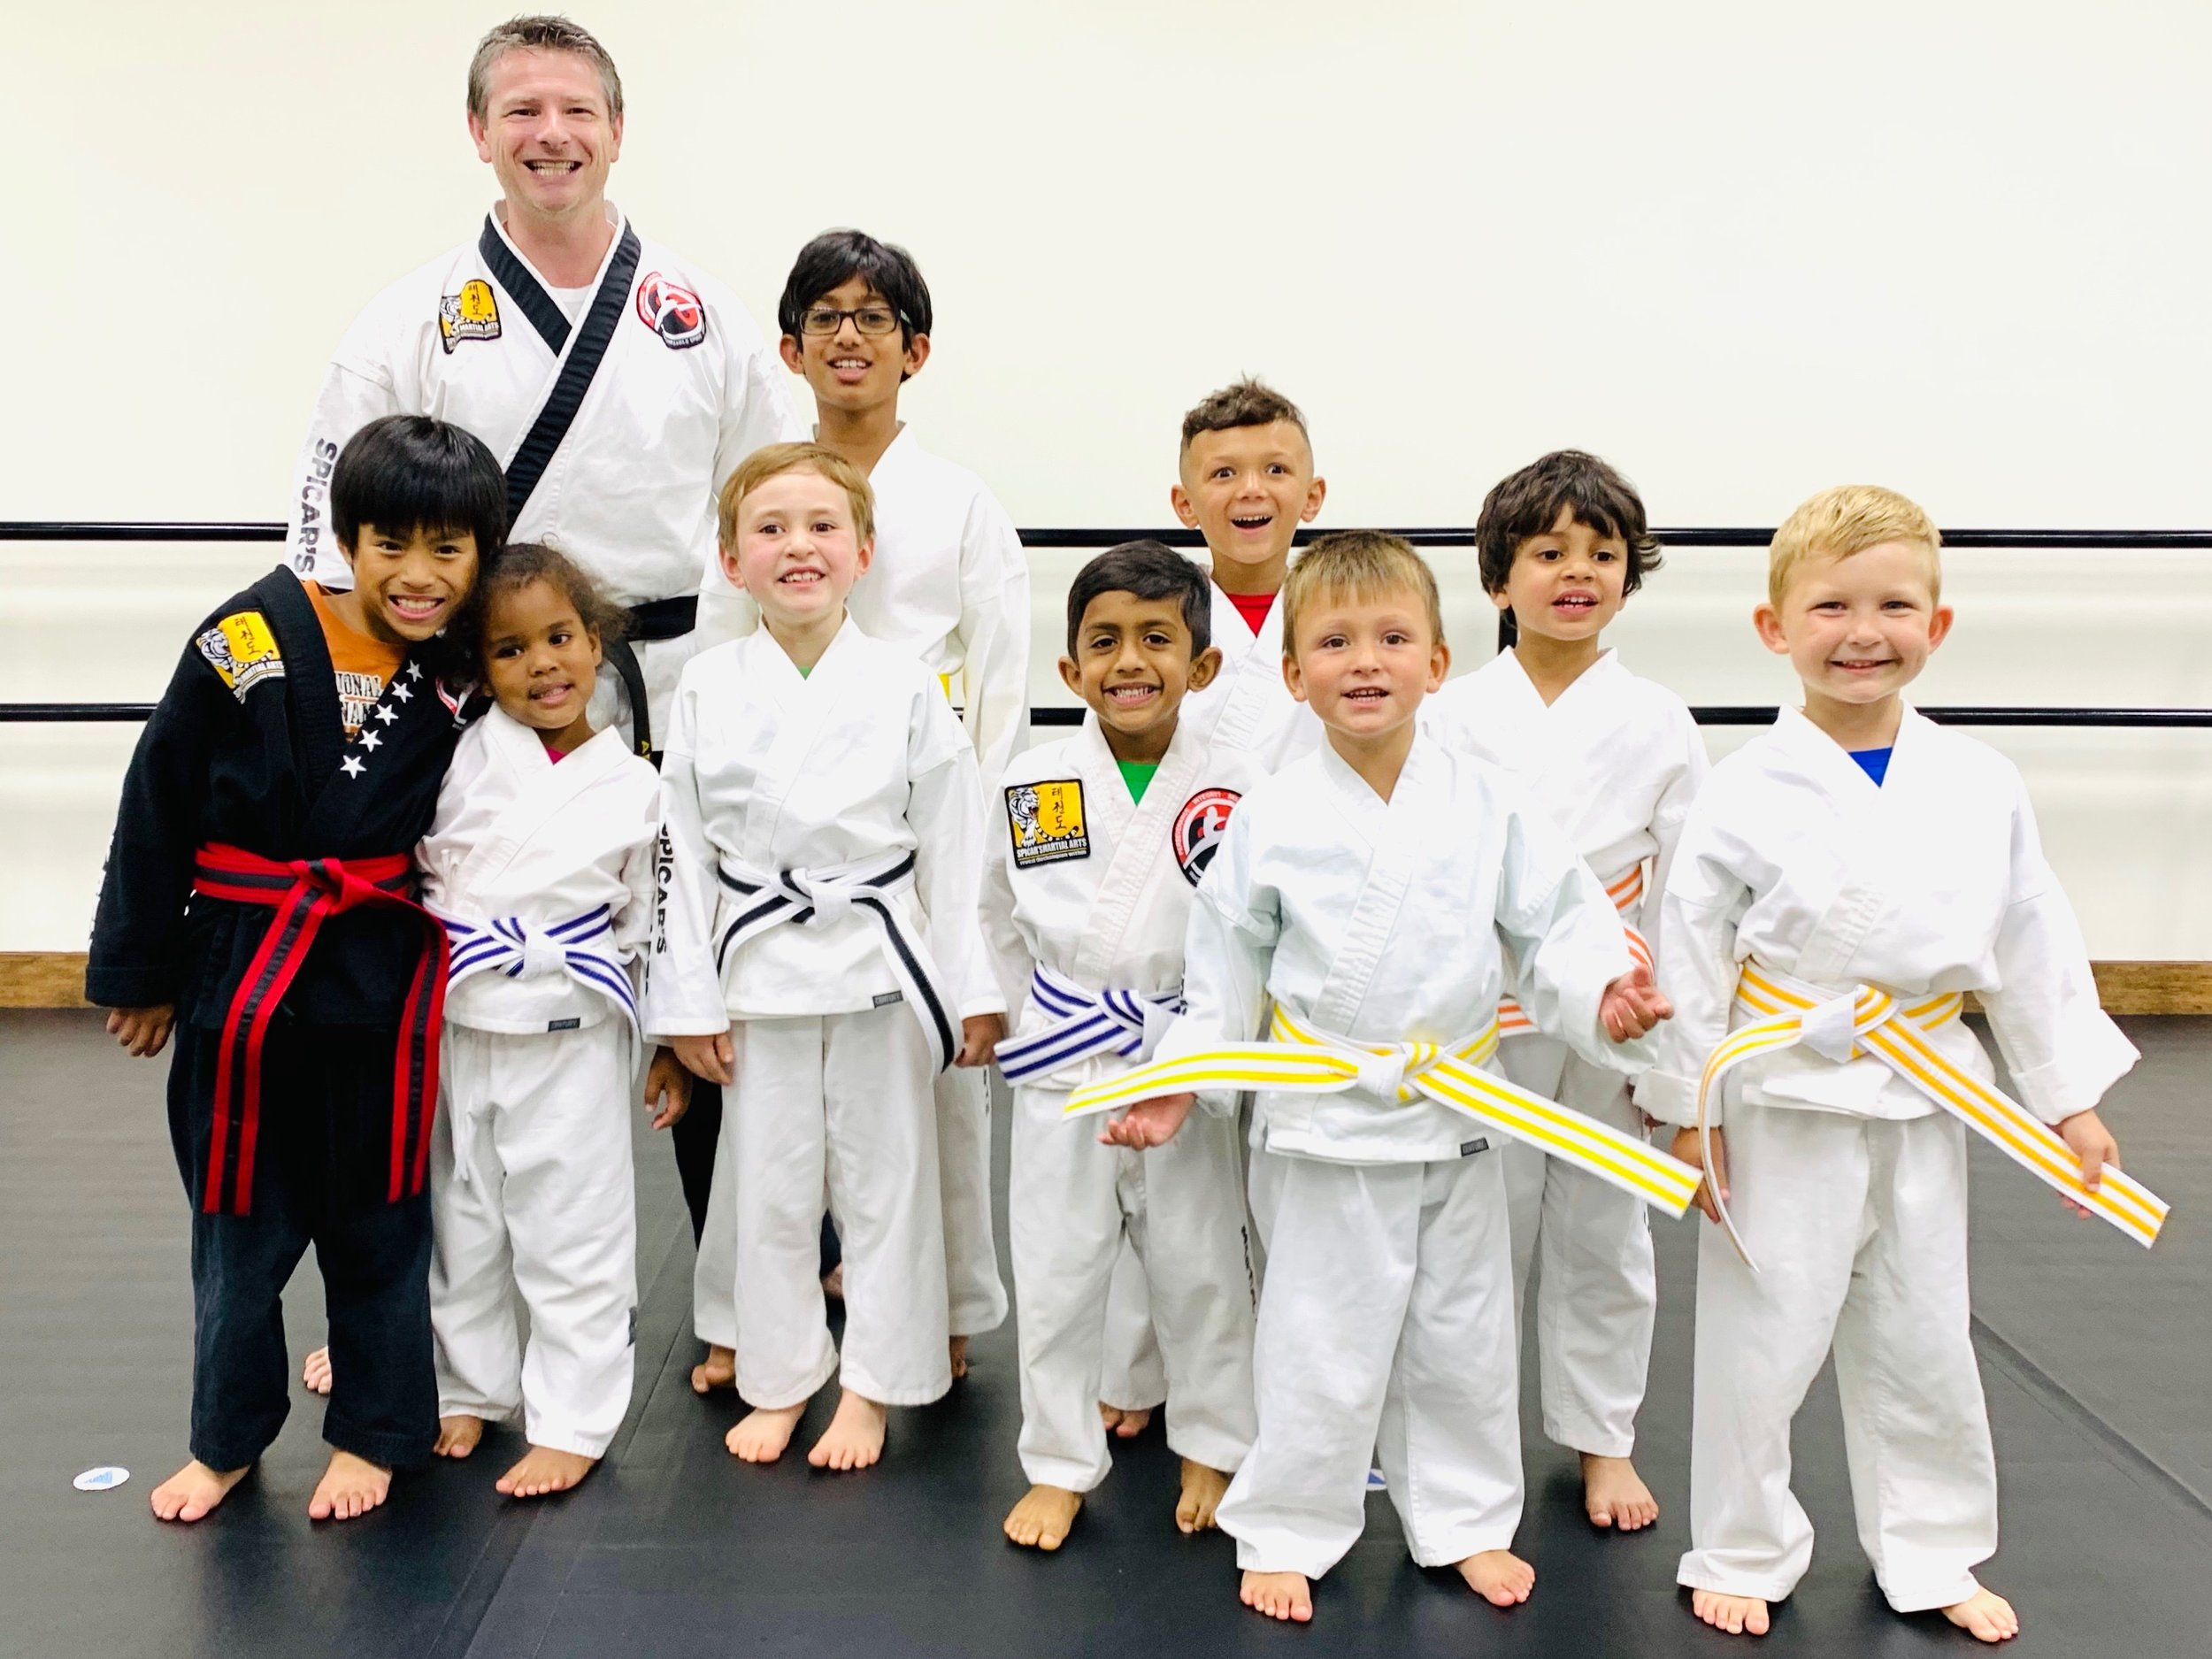 karate-kids-program-souhtlake-keller-grapevine-texas00003.jpeg